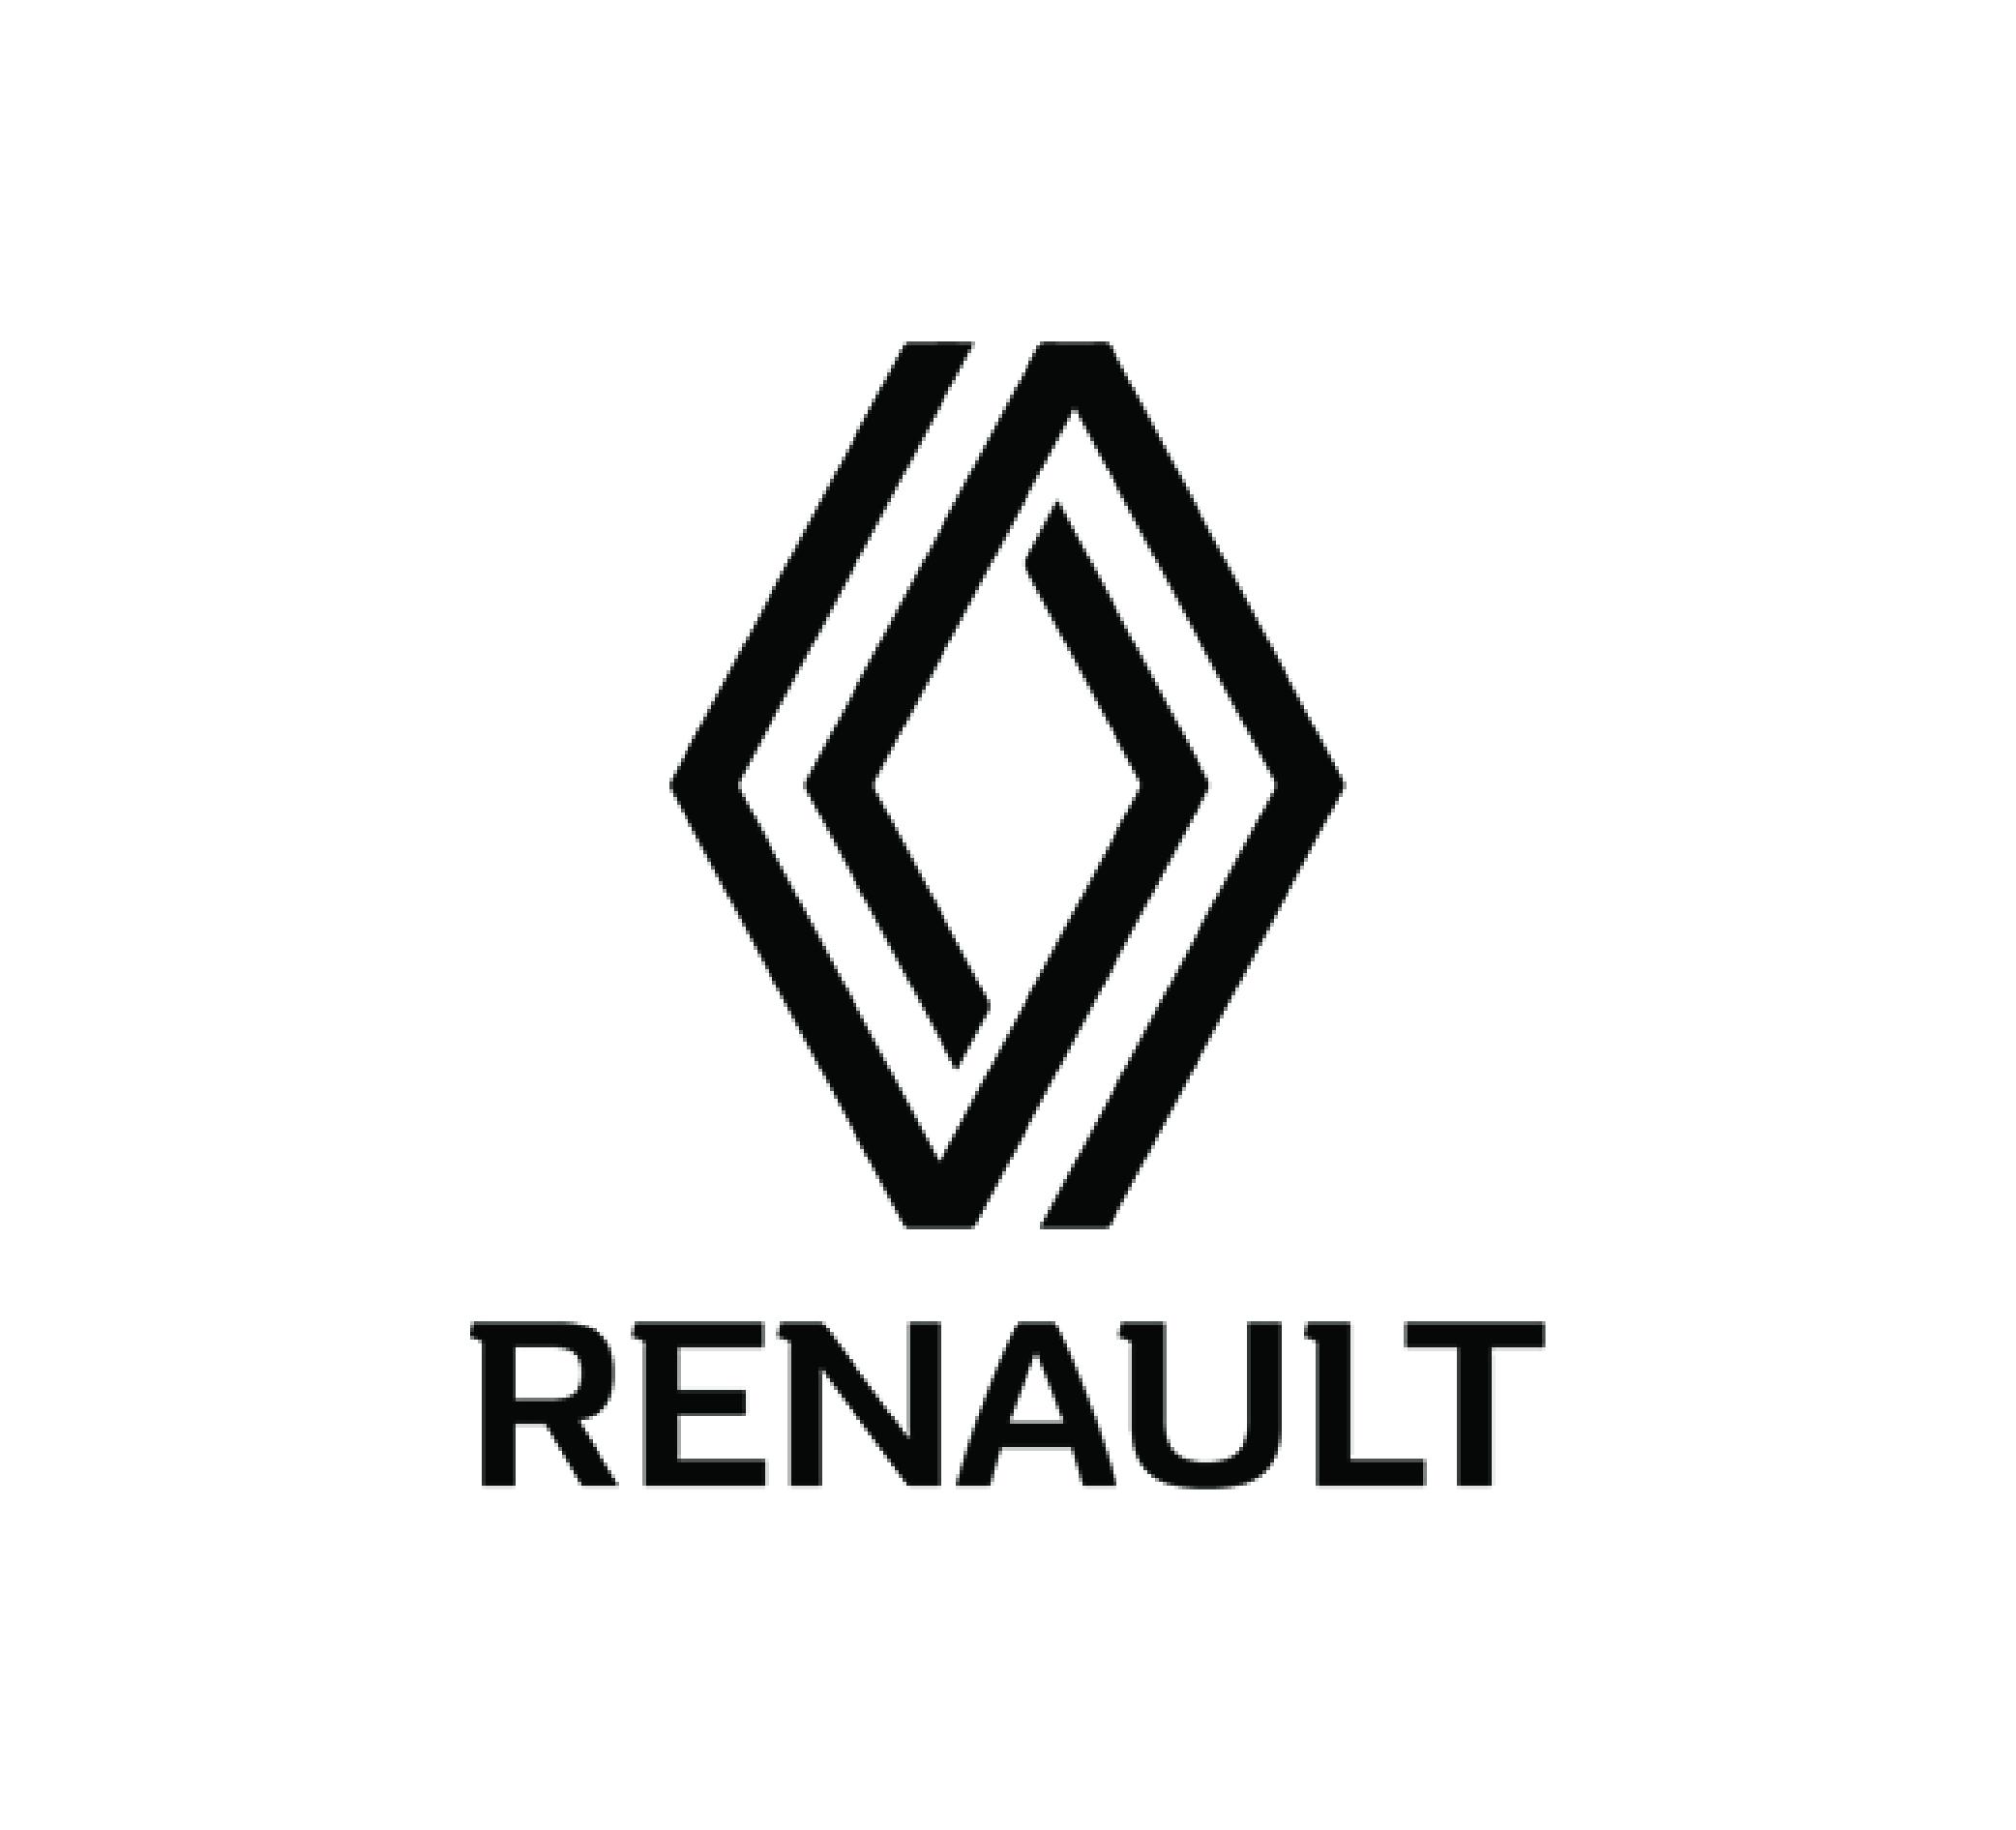 reno-01